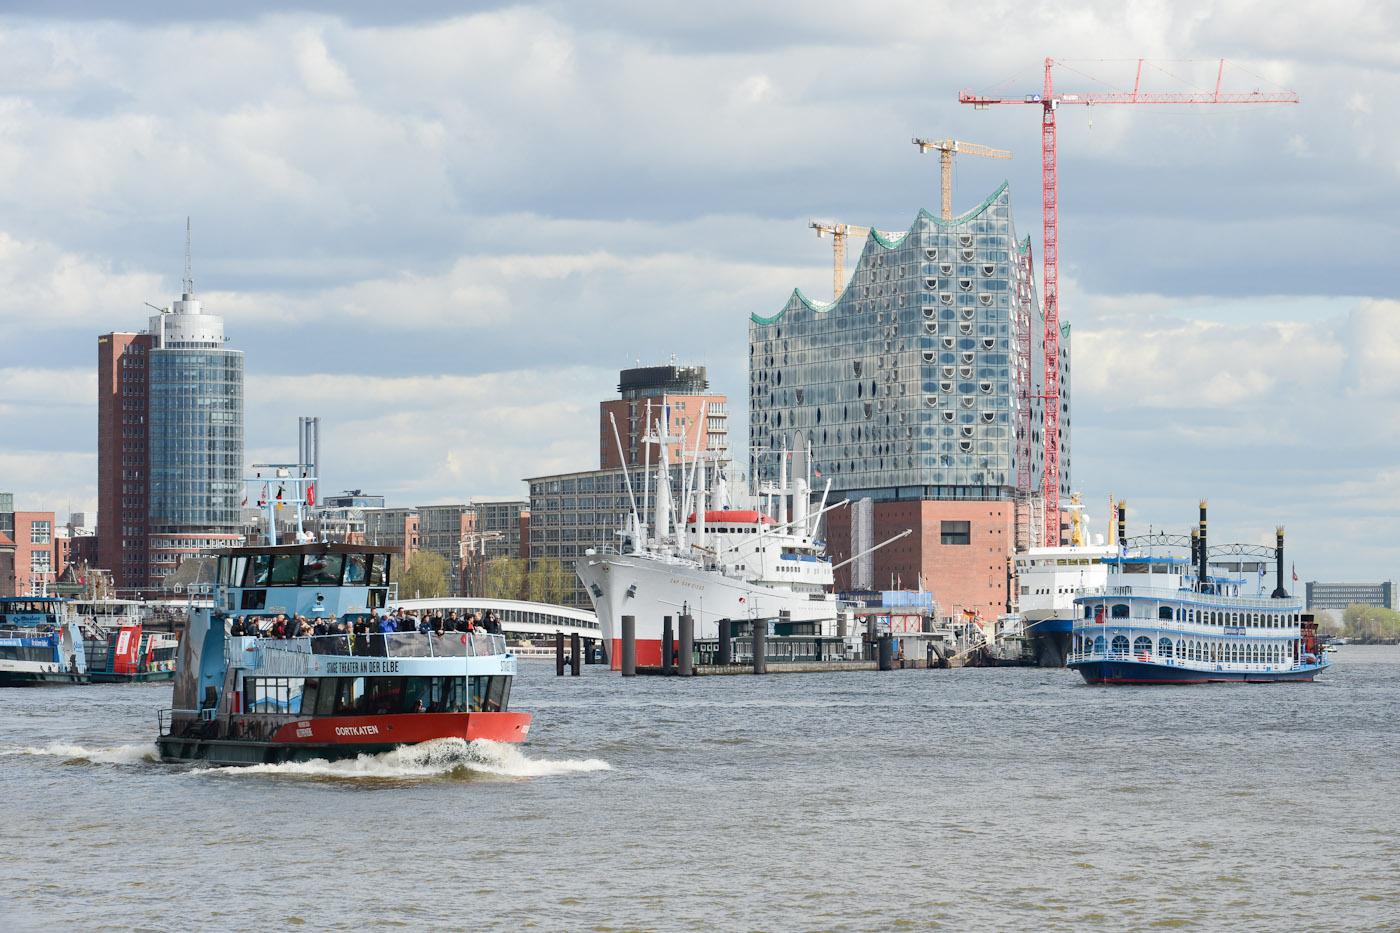 Foto ID 15042607 Lousiana Star, Hafenrundfahrt Hamburg